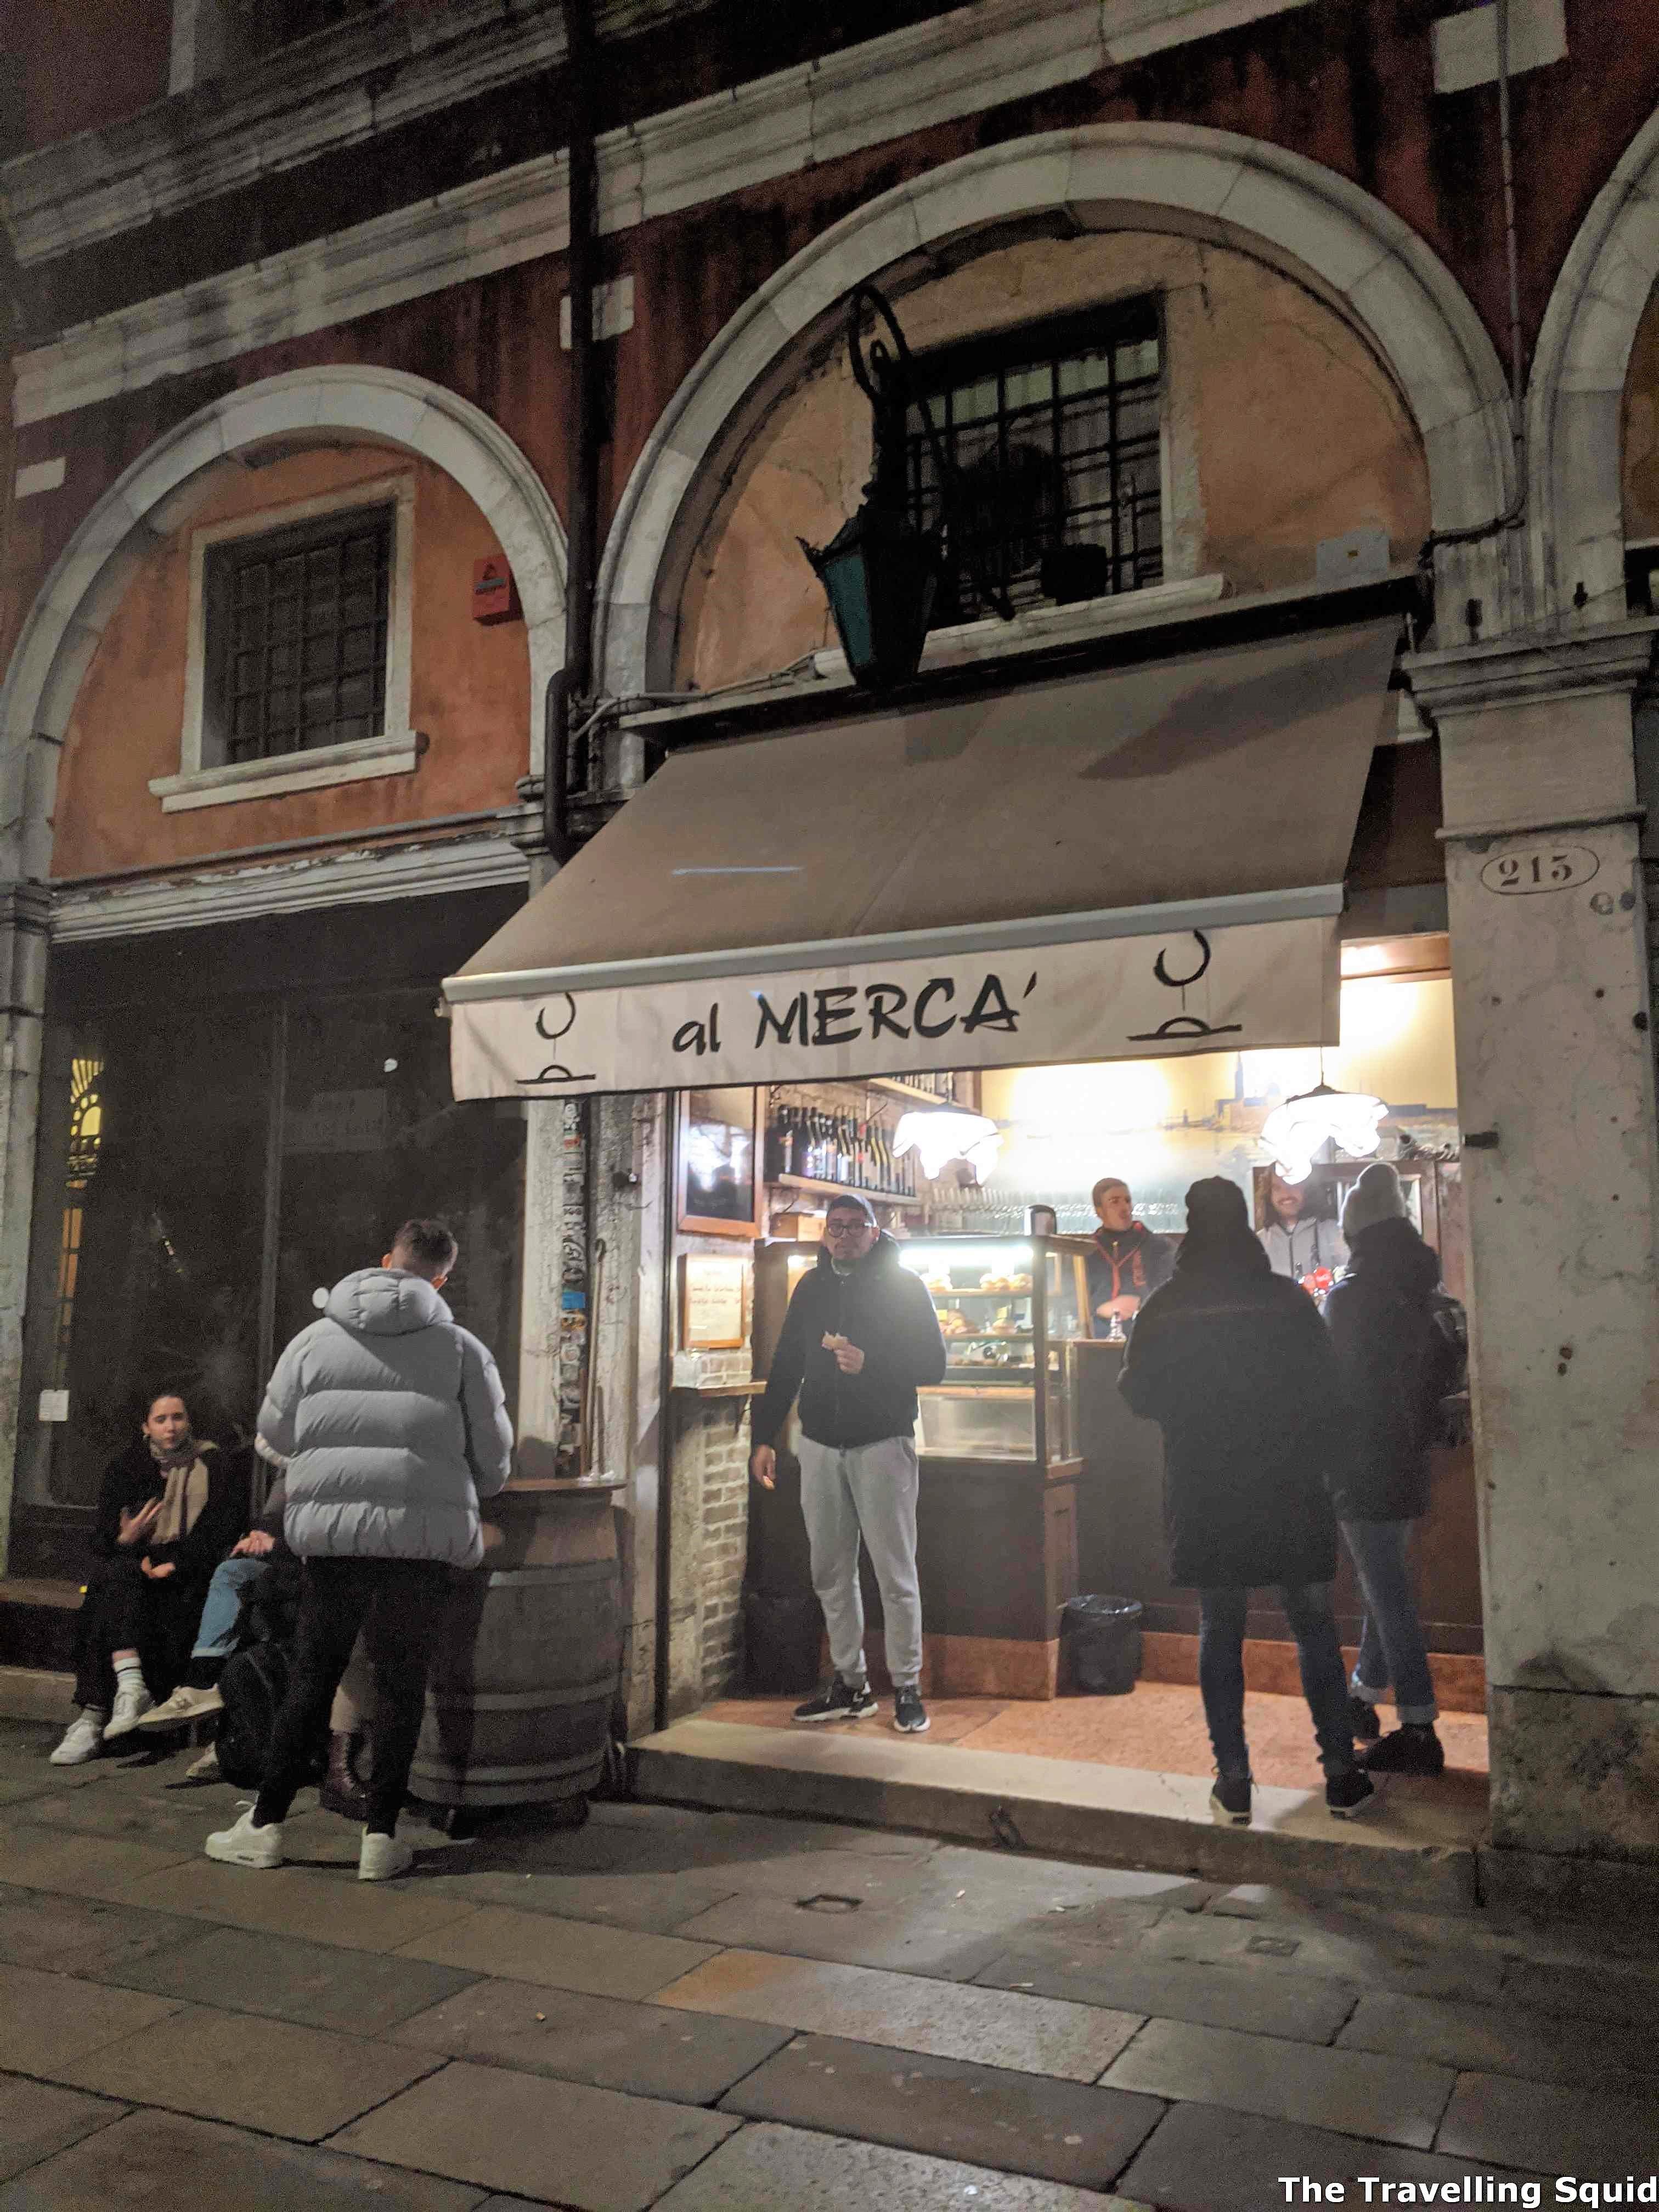 Visit the Al Merca Wine Bar in Venice